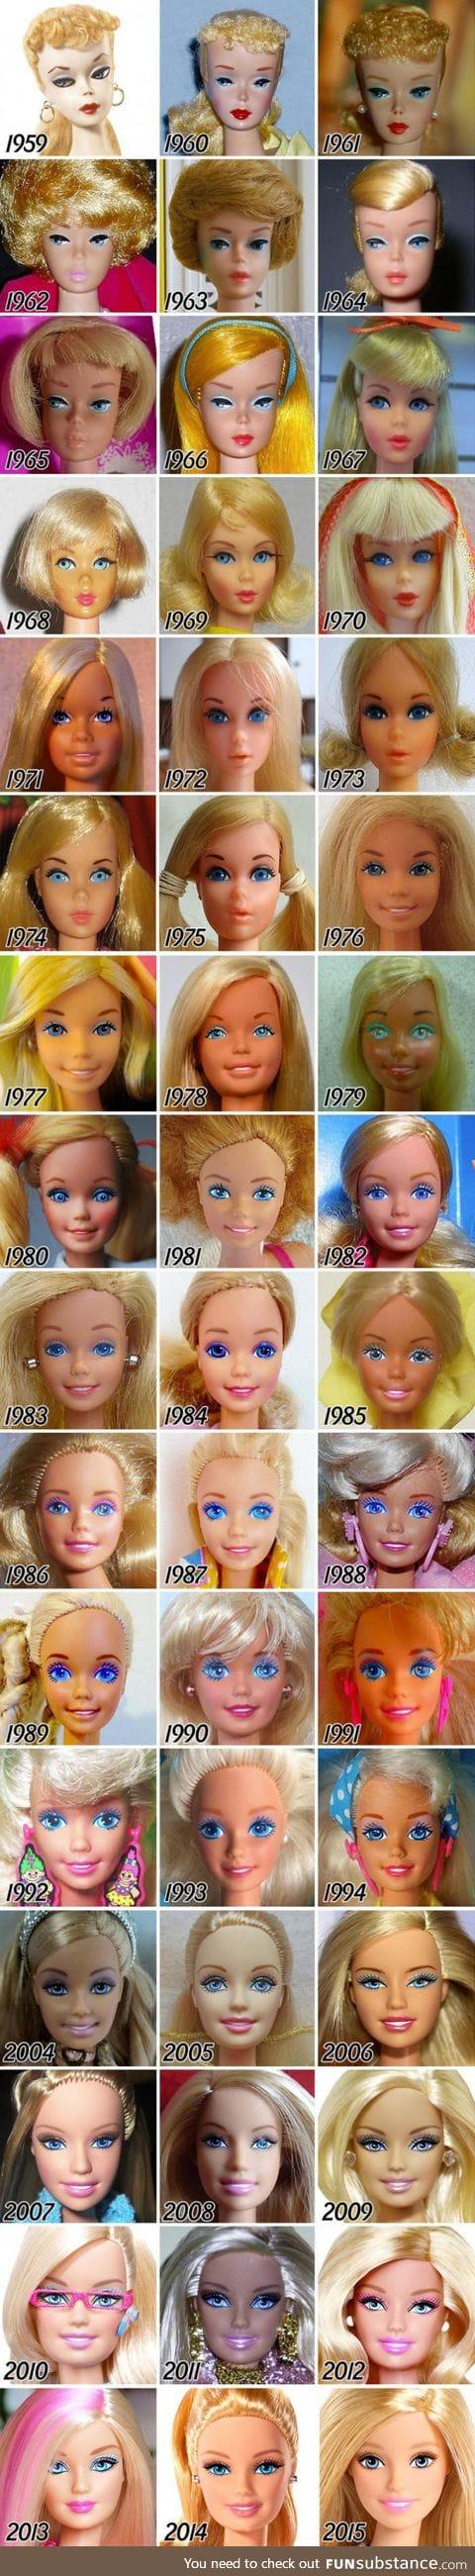 The evolution of Barbie